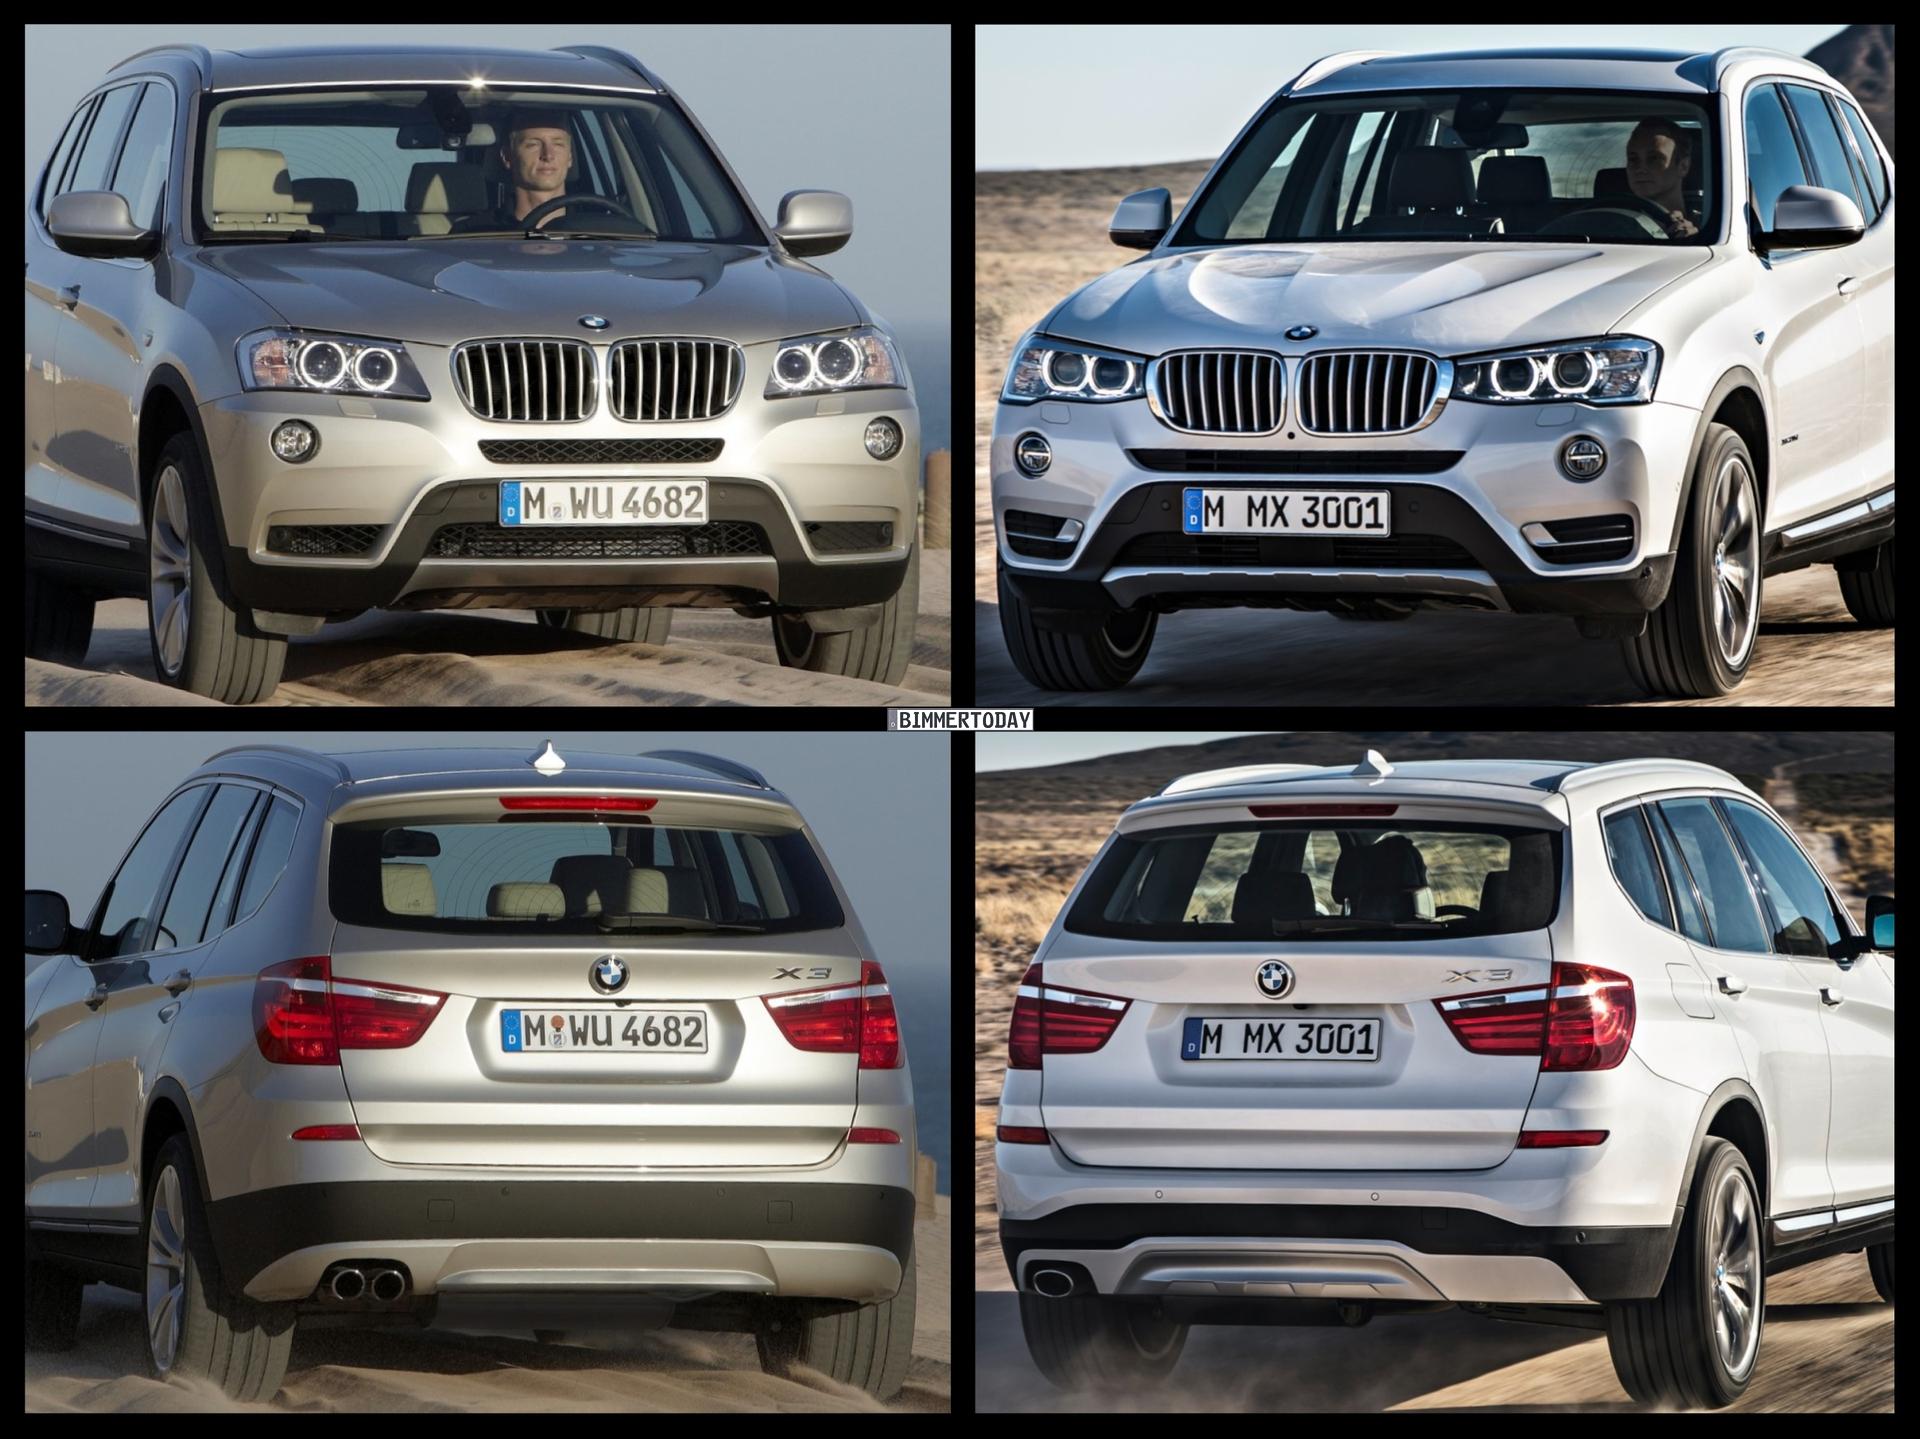 2015 Bmw X3 Facelift Vs Bmw X3 Pre Facelift Photo